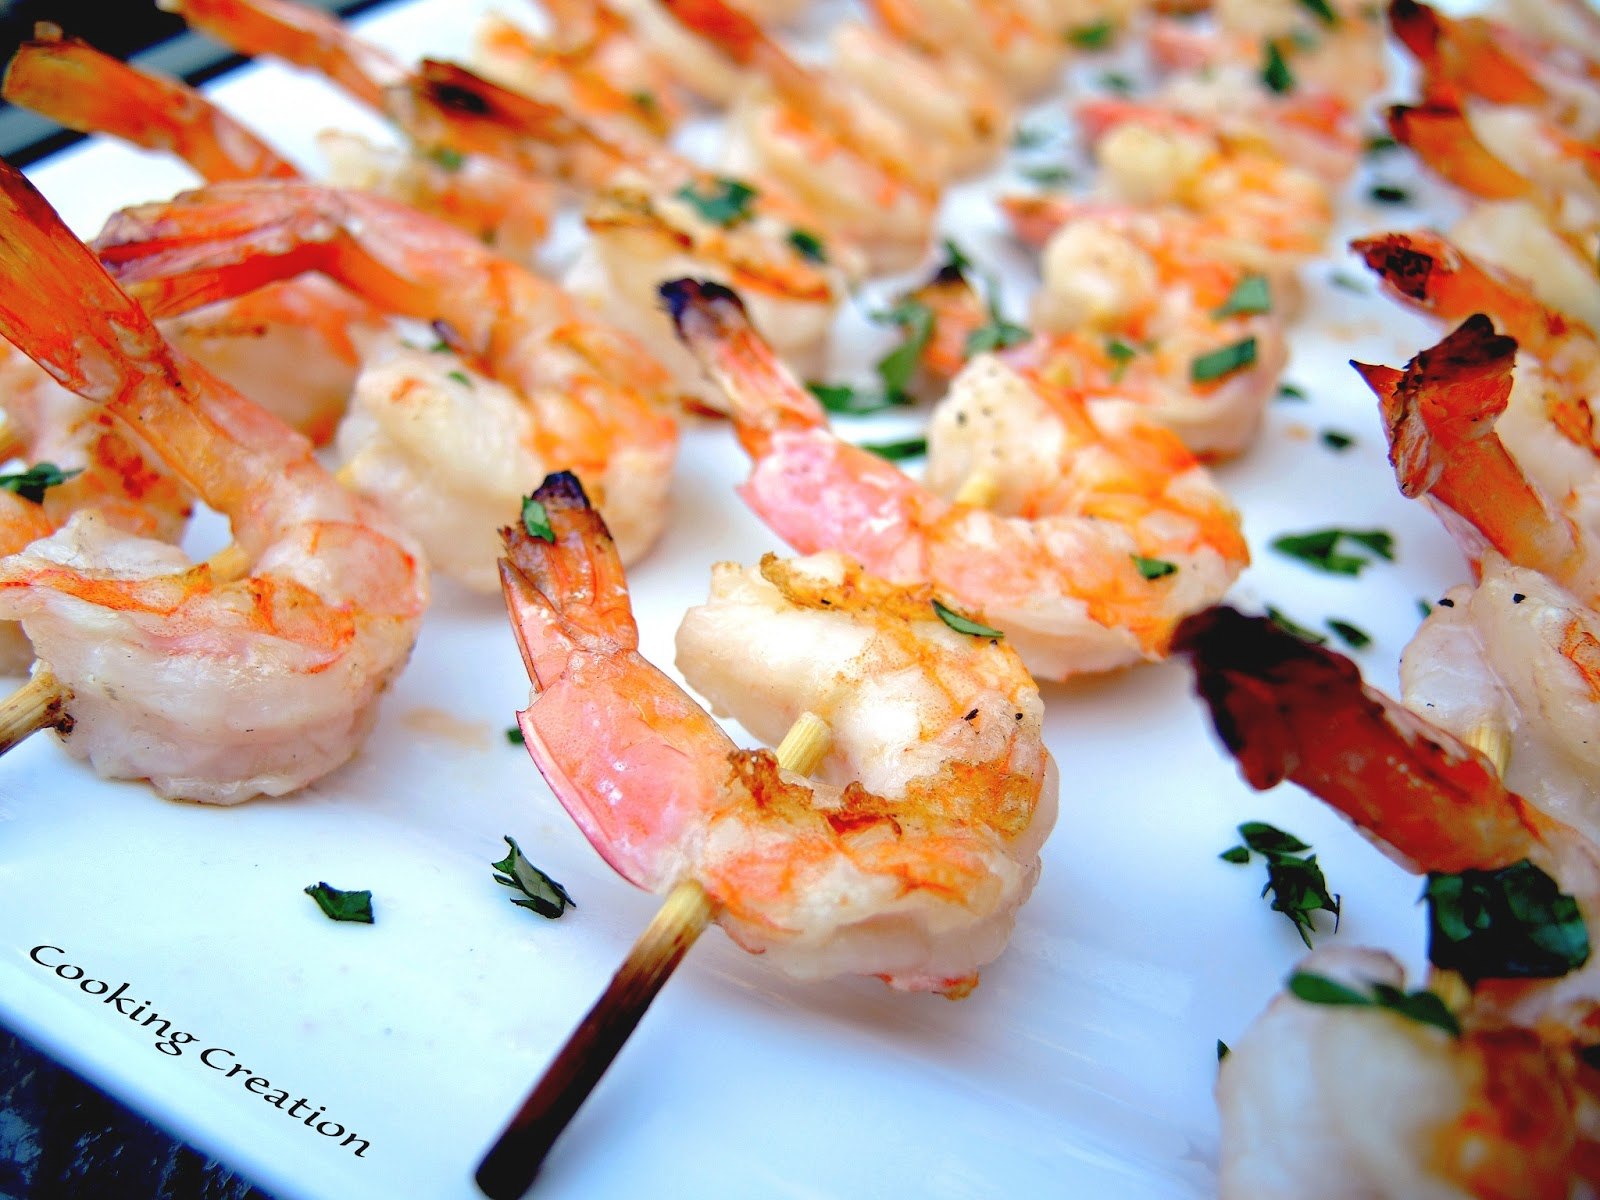 Cooking Creation: Grilled White Wine & Garlic Butter Shrimp Kabobs